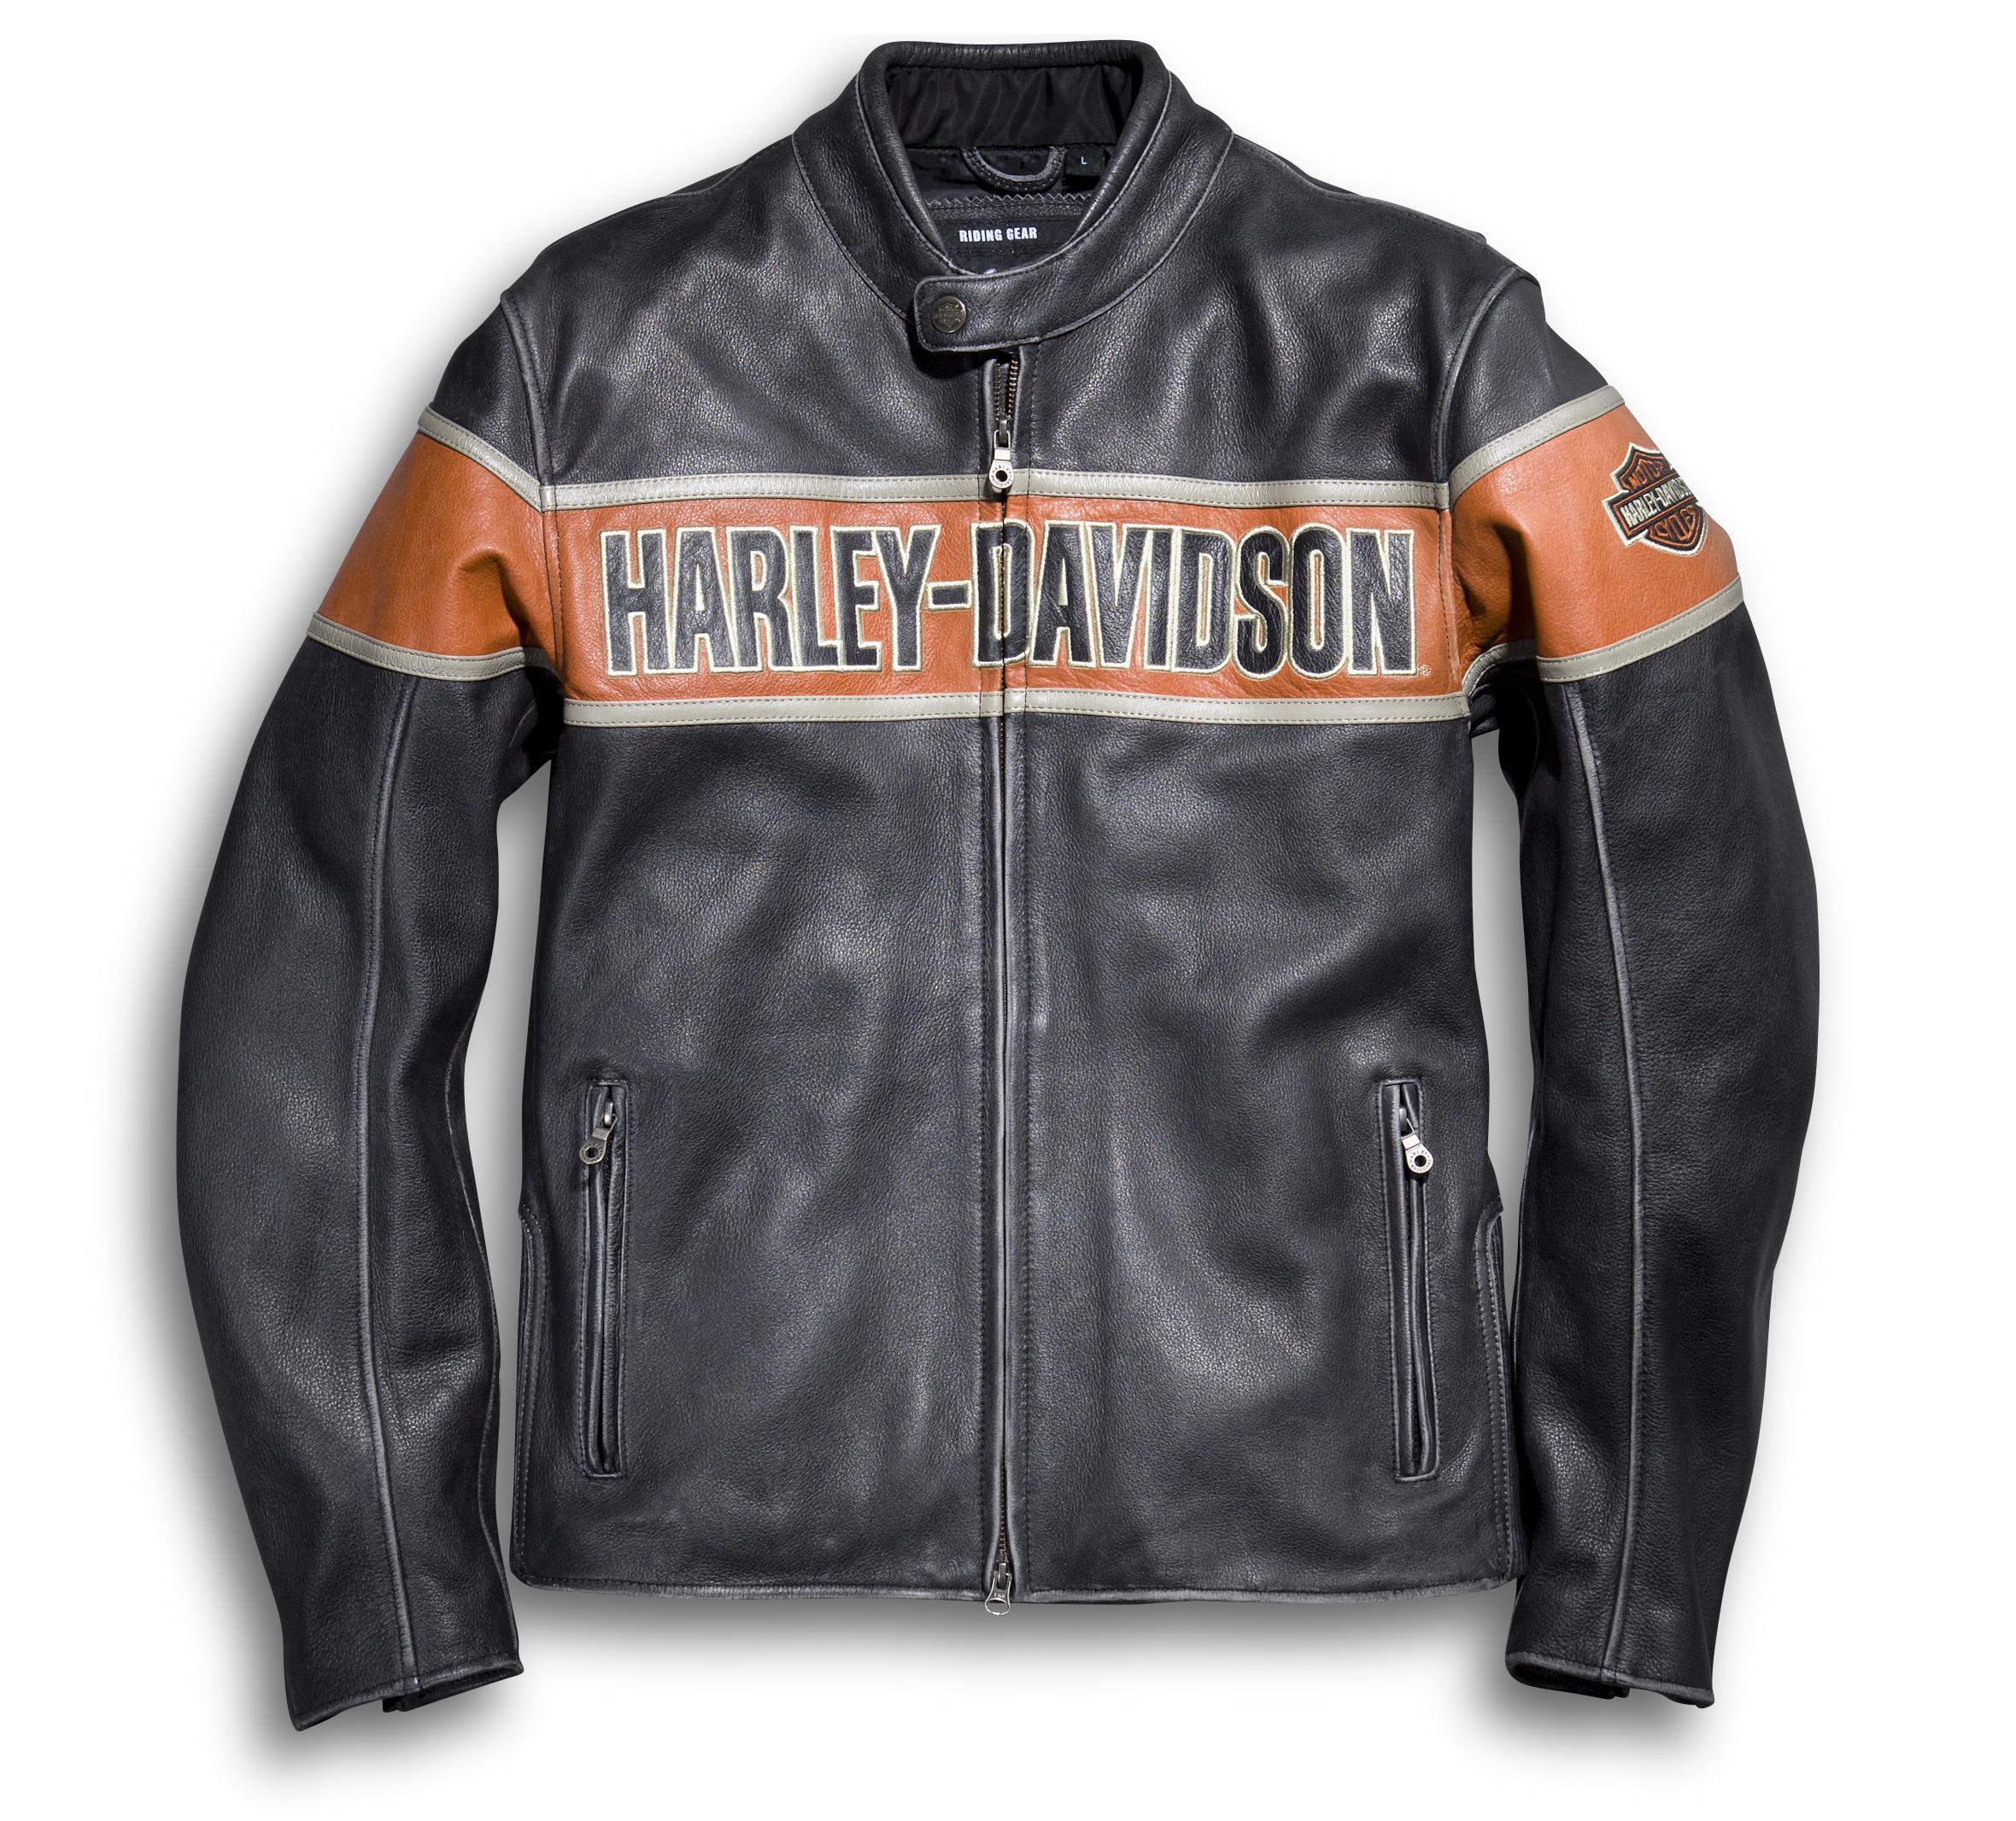 Harley Davidson Victory Lane Style Special Biker Genuine Cowhide Leather Jacket